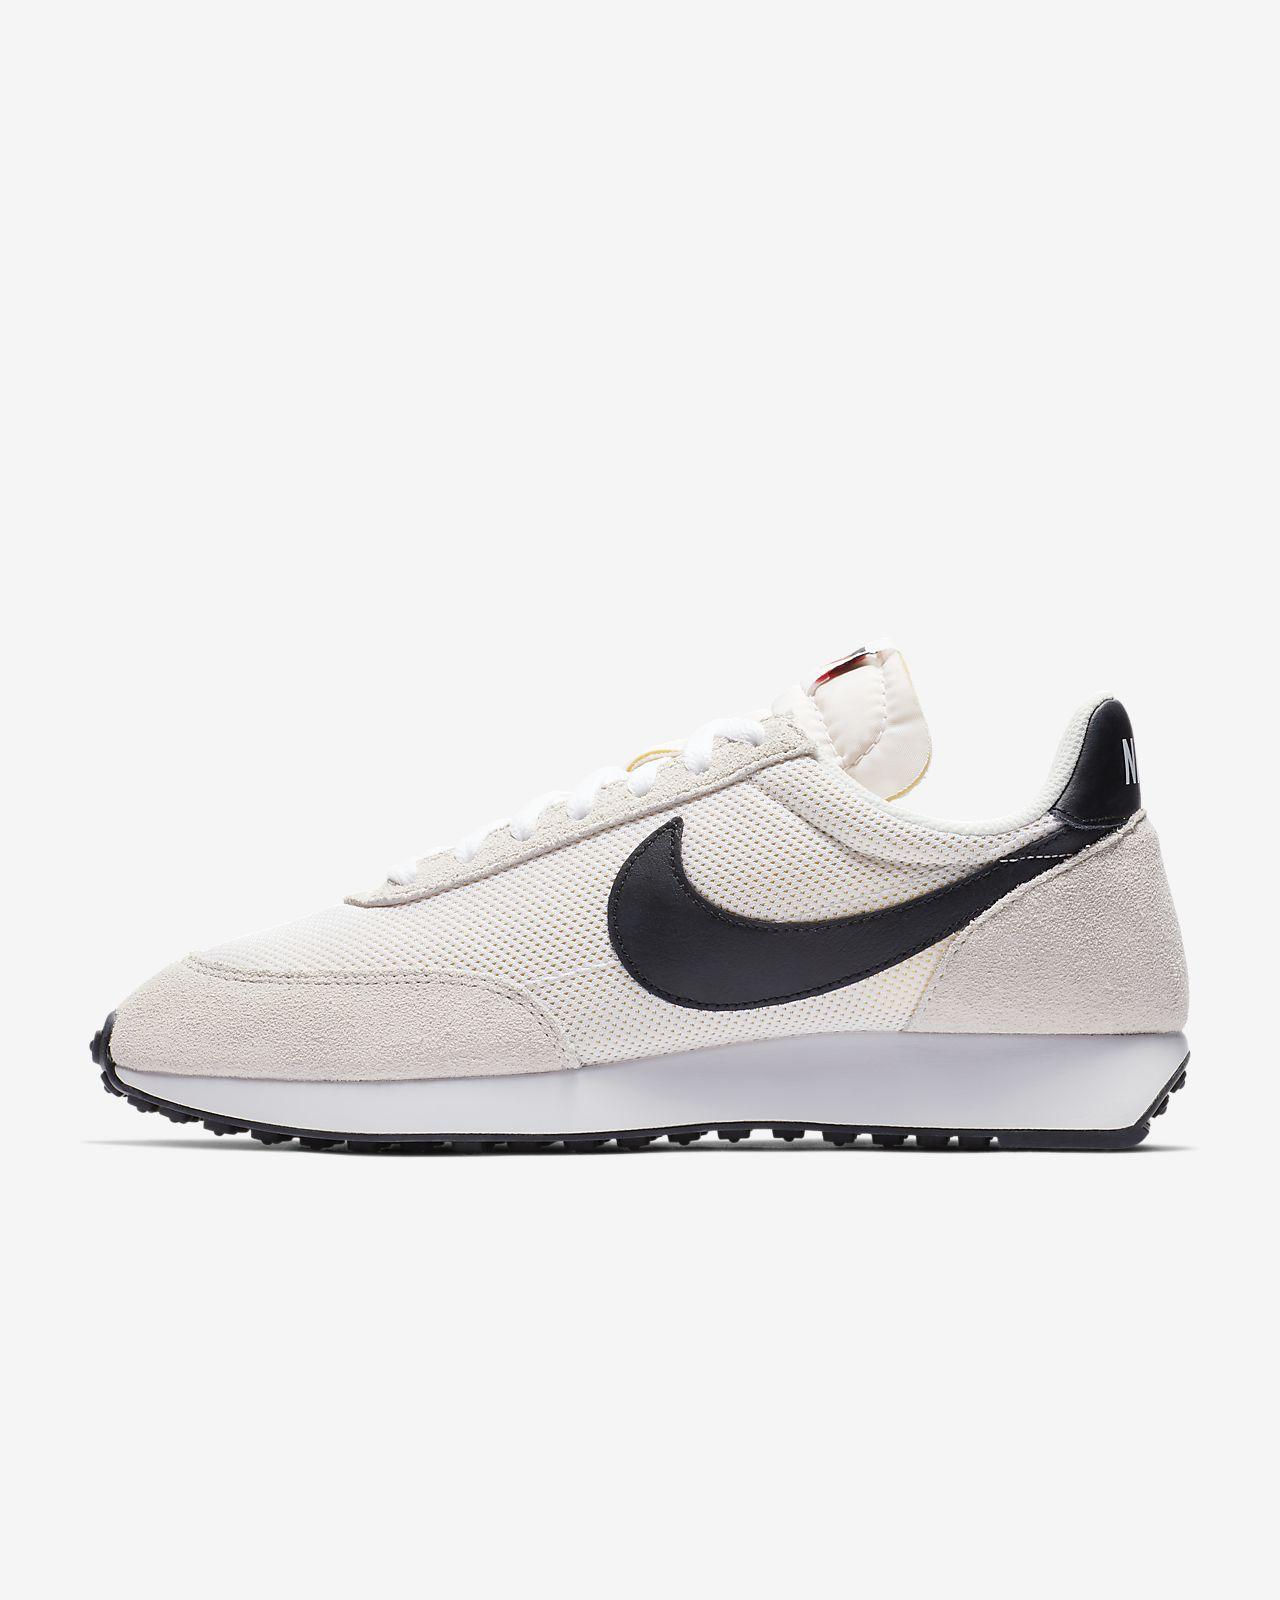 Nike Air Tailwind 79 Herenschoen